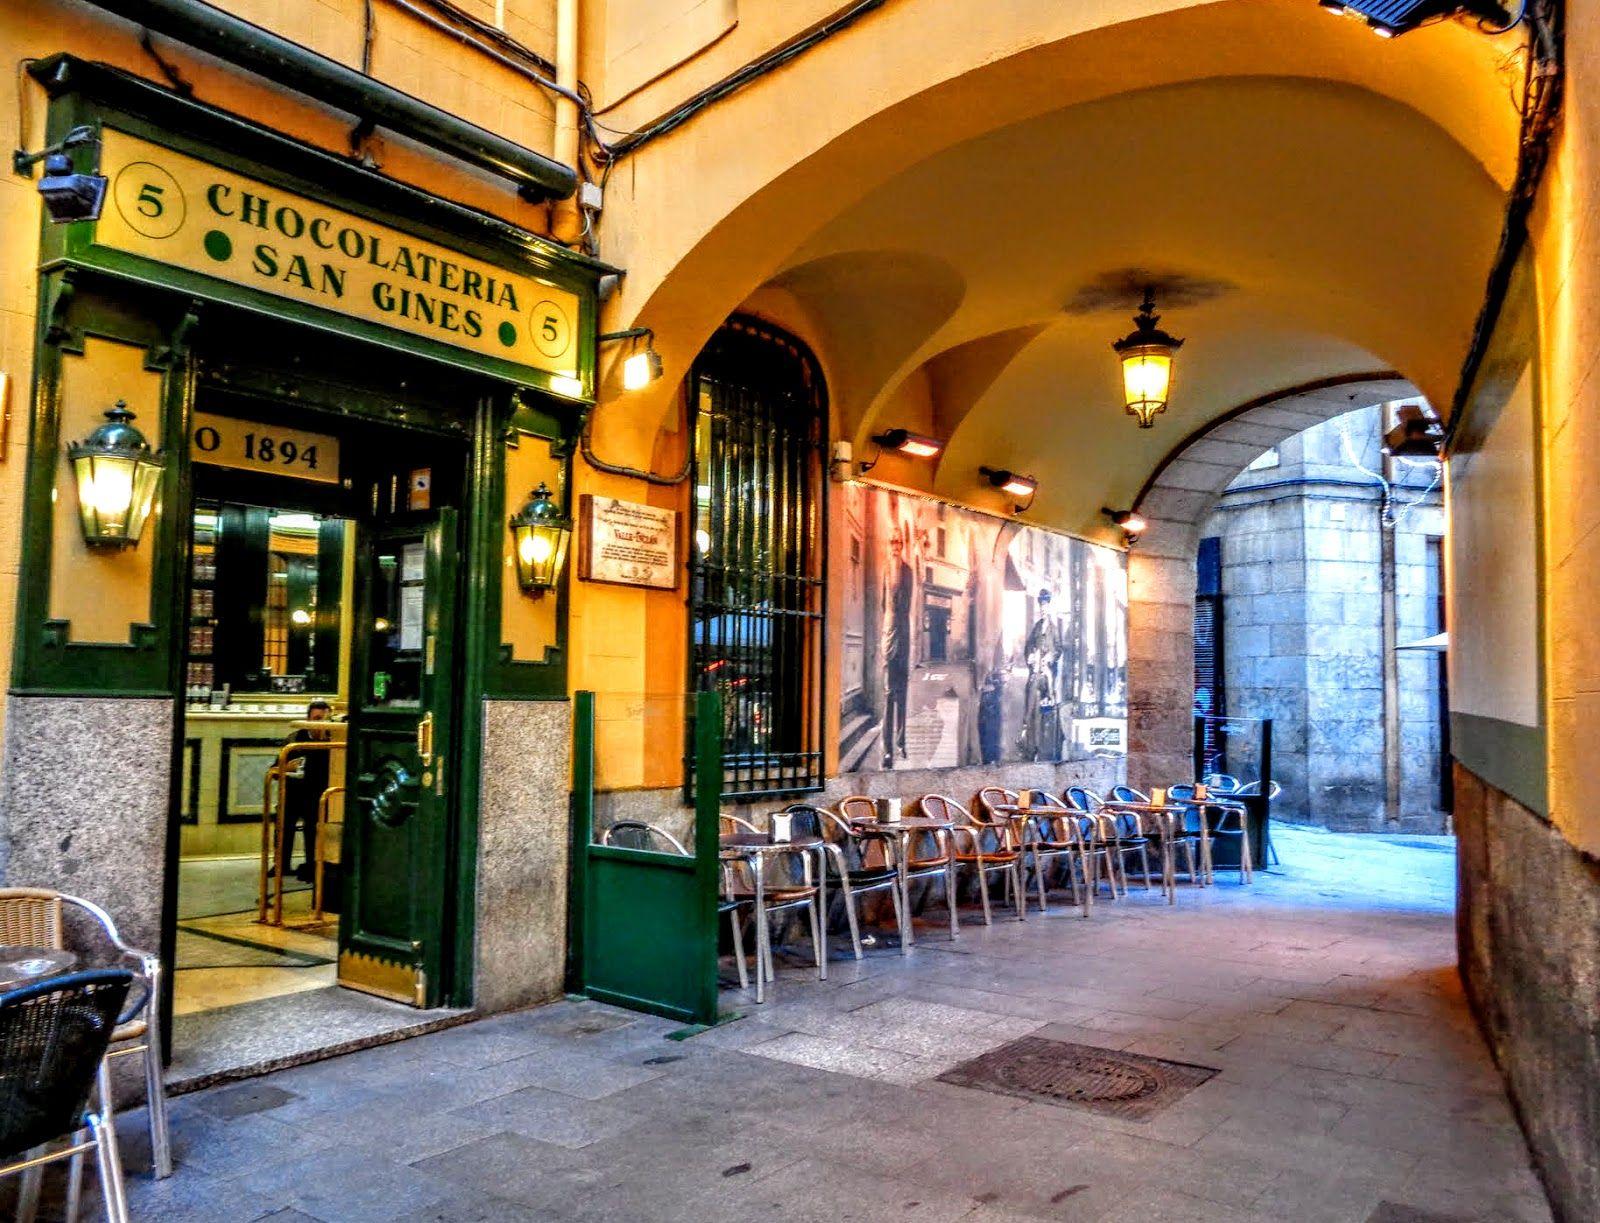 chocolateria San Gines, Madrid | Madrid, Spain, Candy